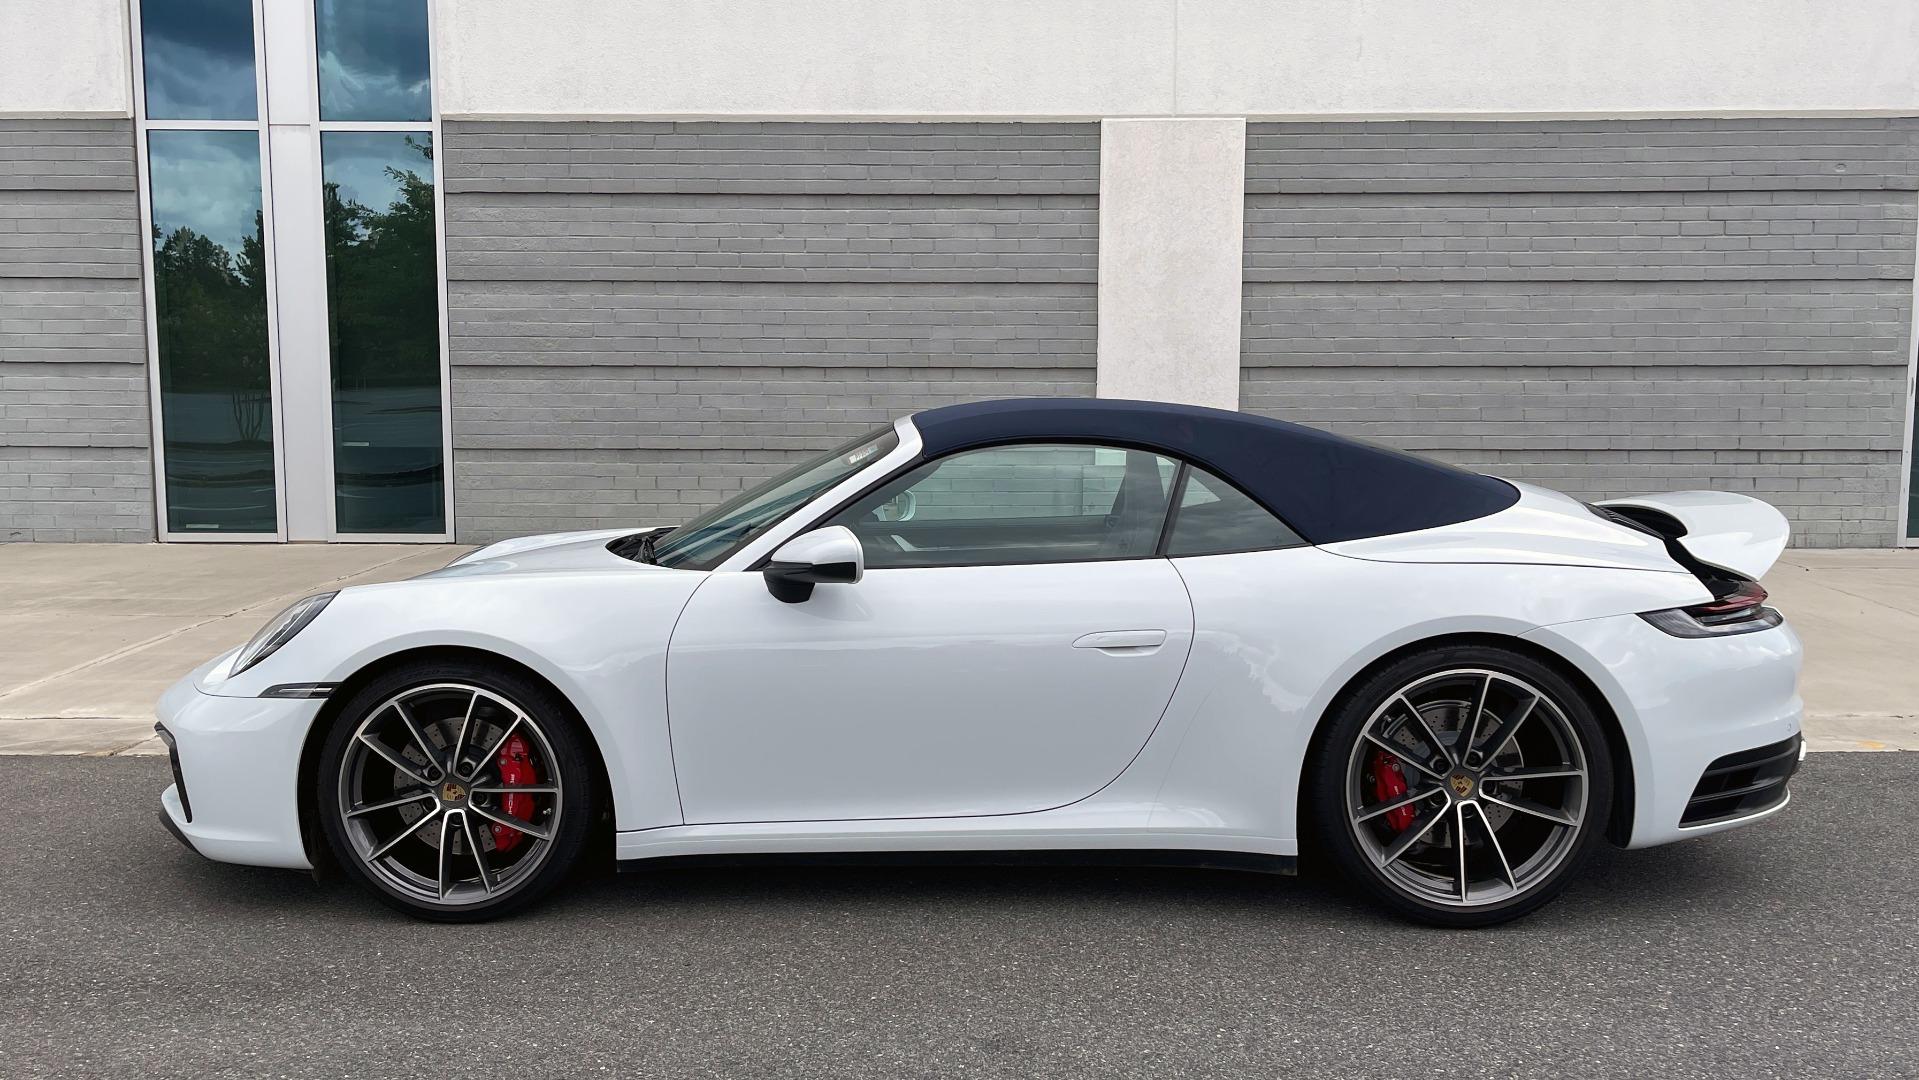 Used 2020 Porsche 911 CARRERA 4S CABRIOLET PREMIUM SPORT PKG / NAV / BOSE / LIGHT DESIGN PKG for sale $167,595 at Formula Imports in Charlotte NC 28227 10